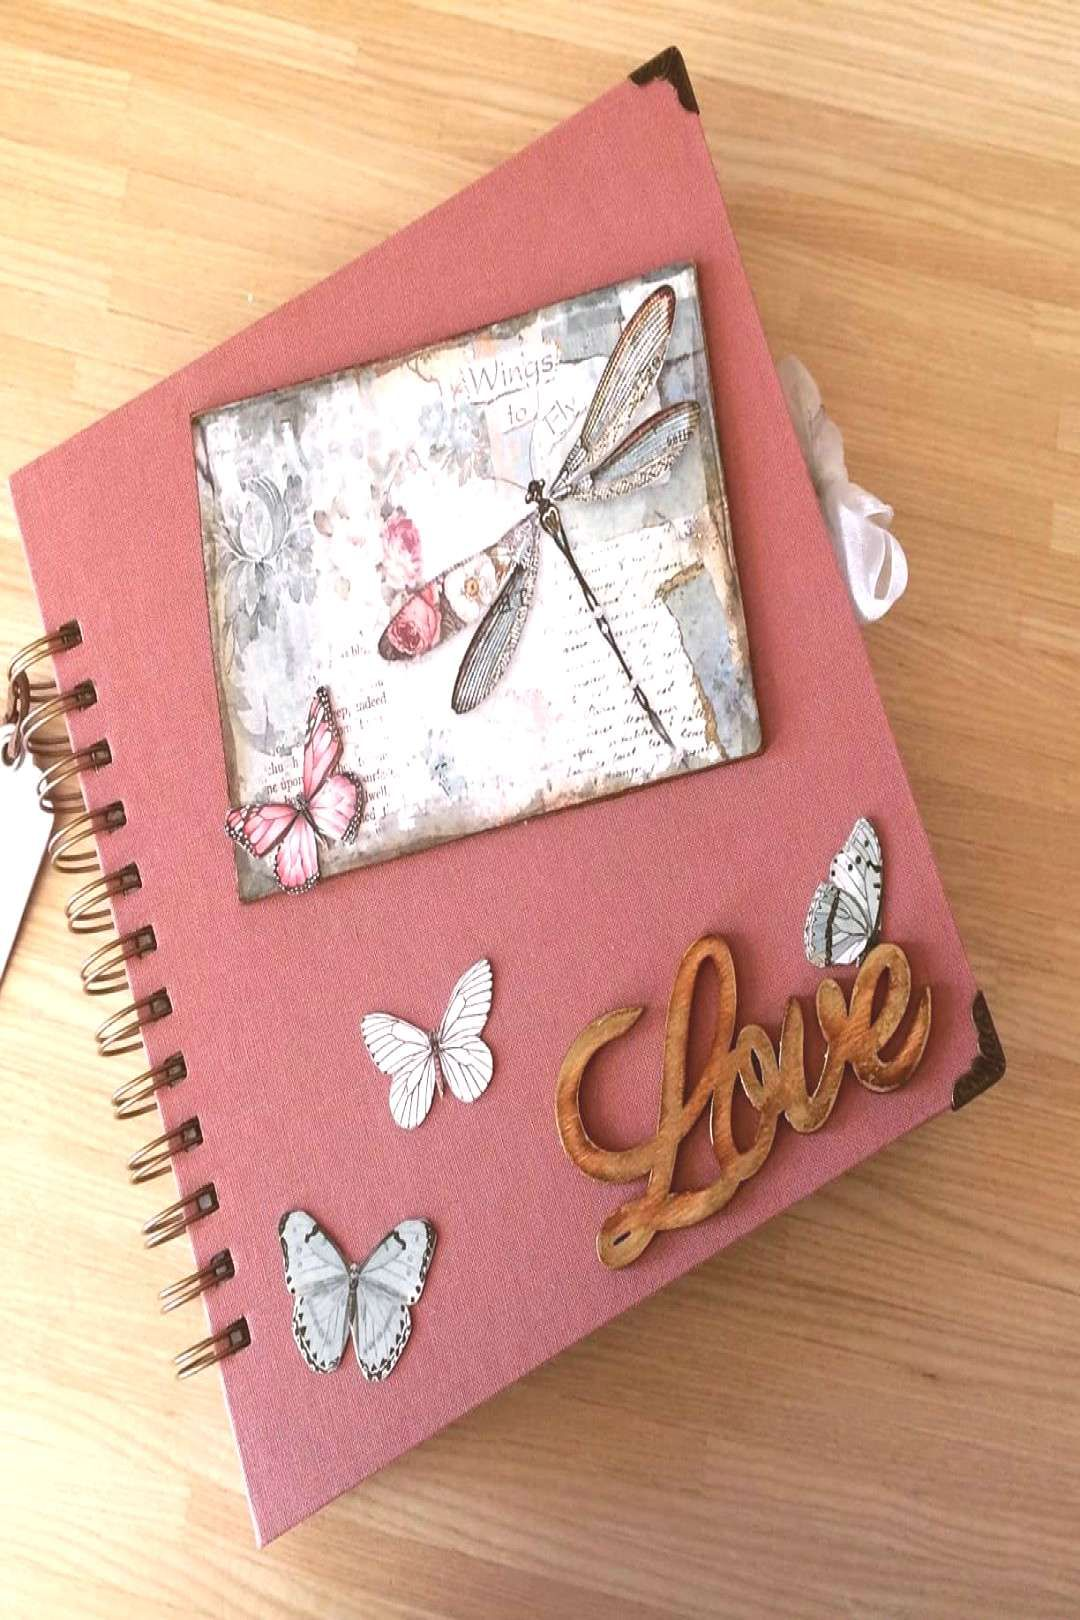 #encuadernacionartesanal #february #petite #272020 #album #hecho #mucho #photo #amor #love #arte #mari #con #by #on Album hecho con mucho amor!! #love #encuadernacionartesanal #arteYou can find Cr...